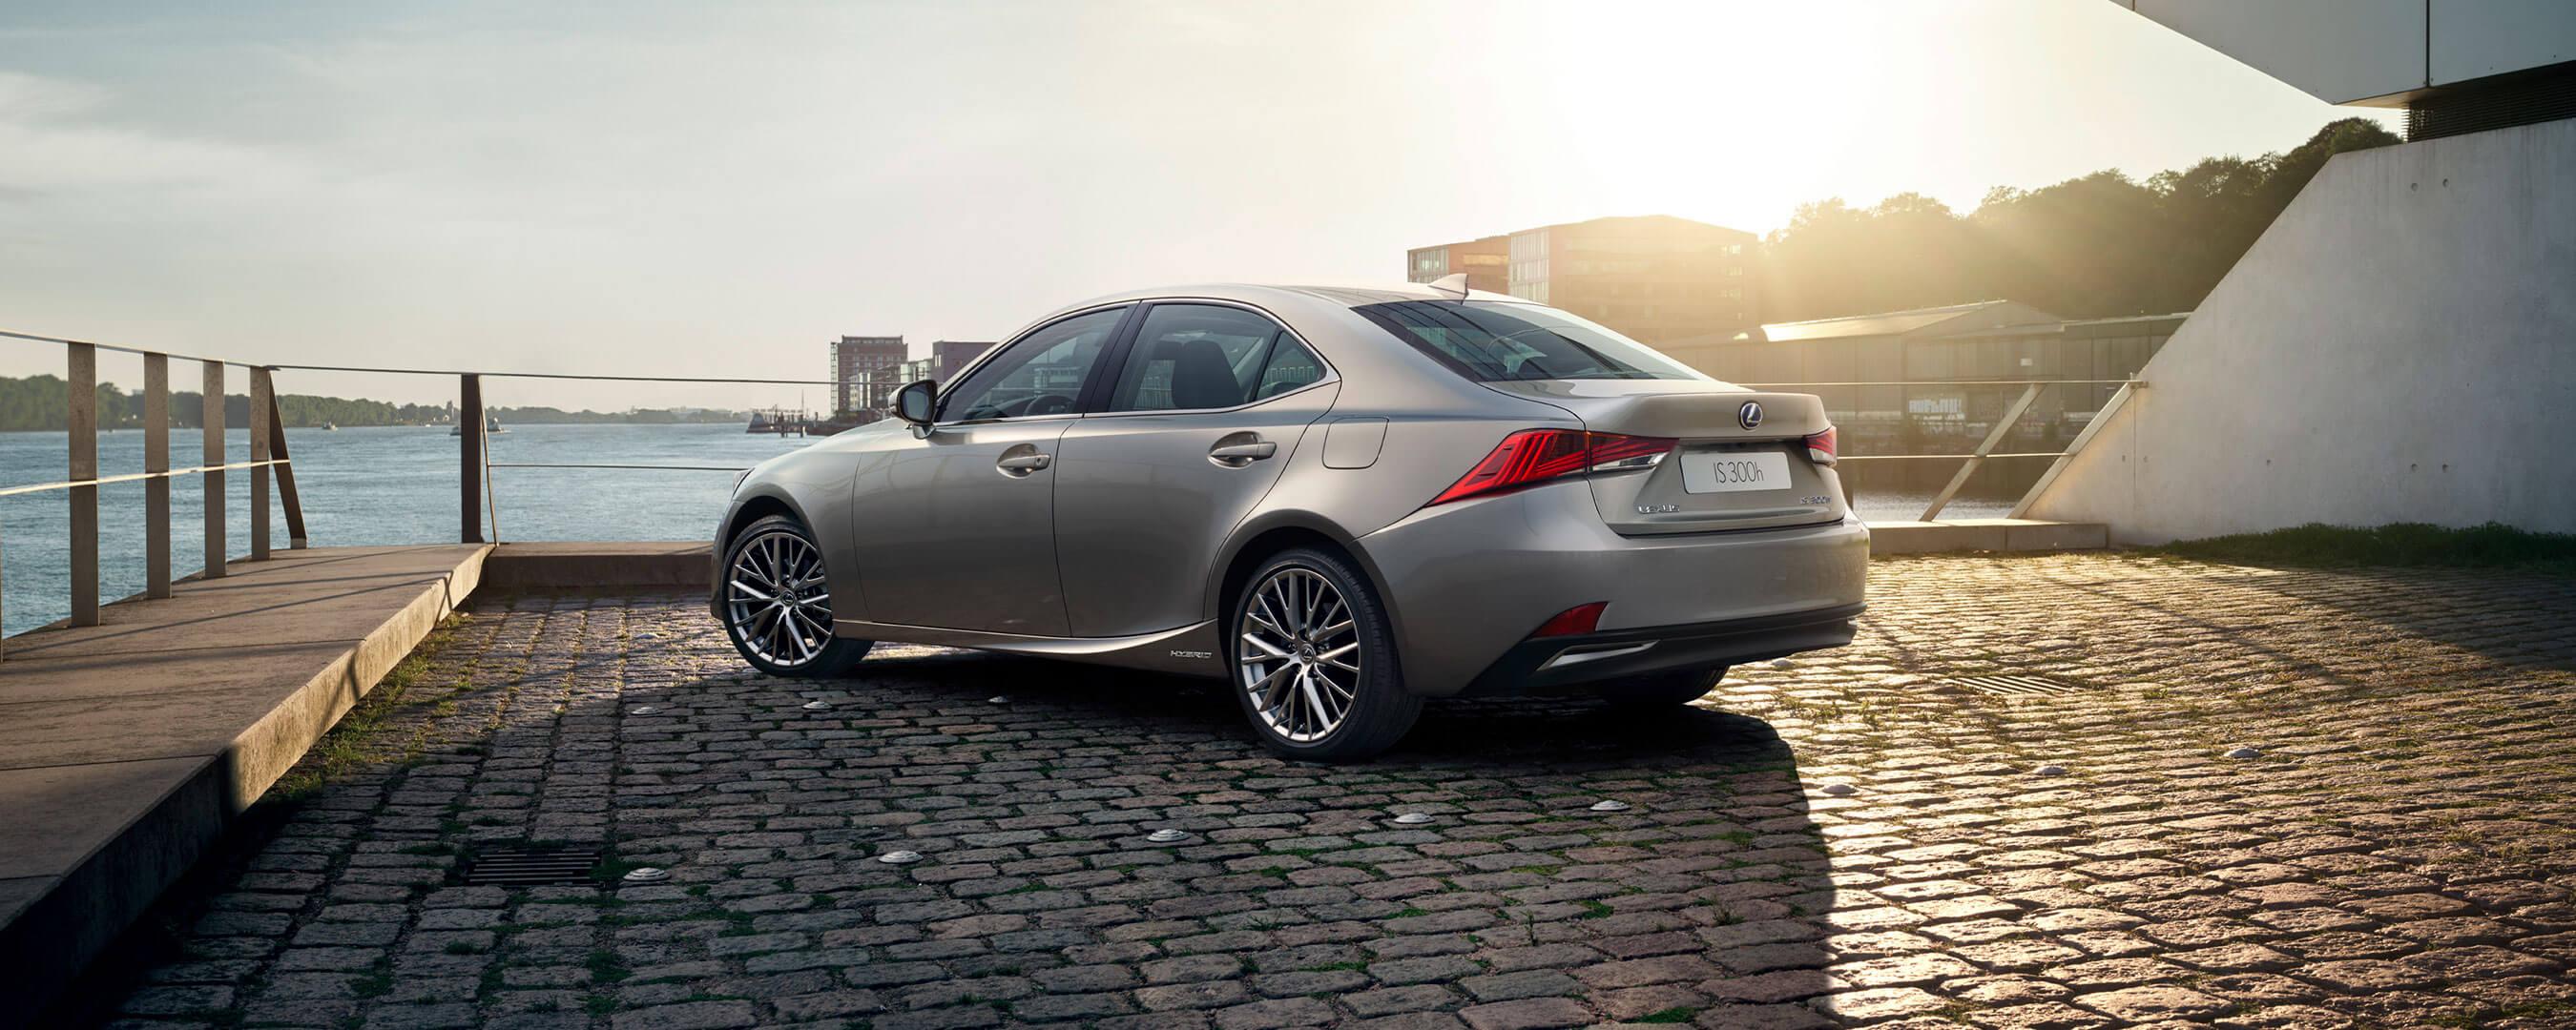 Lexus IS Luxury Sports Saloon